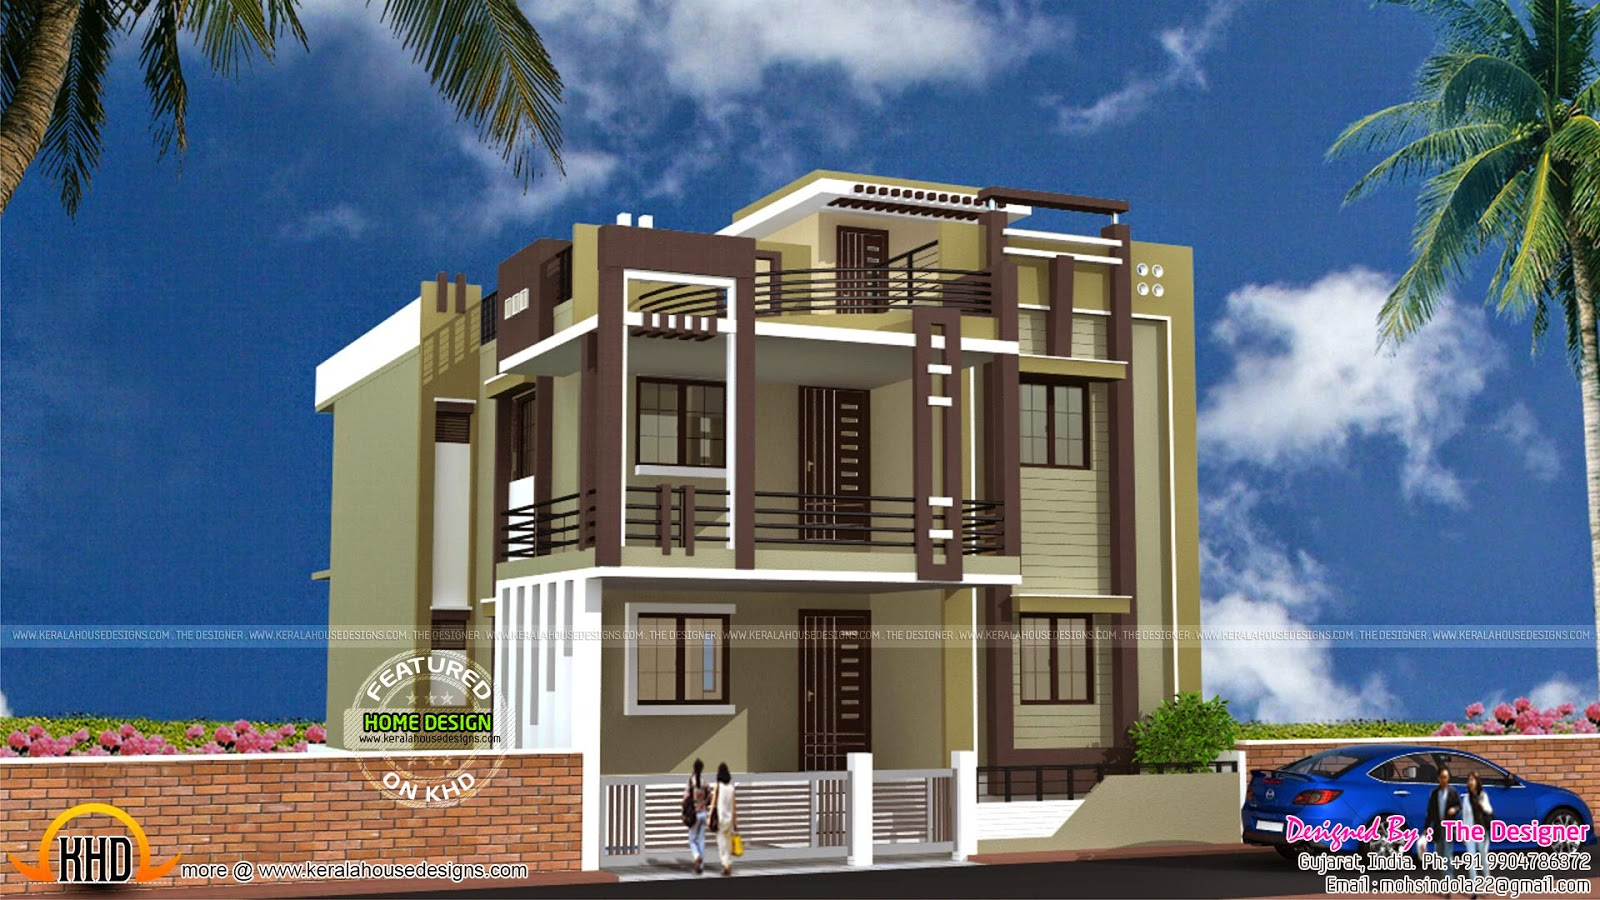 5 bedroom Gujarat house exterior Kerala home design and floor plans